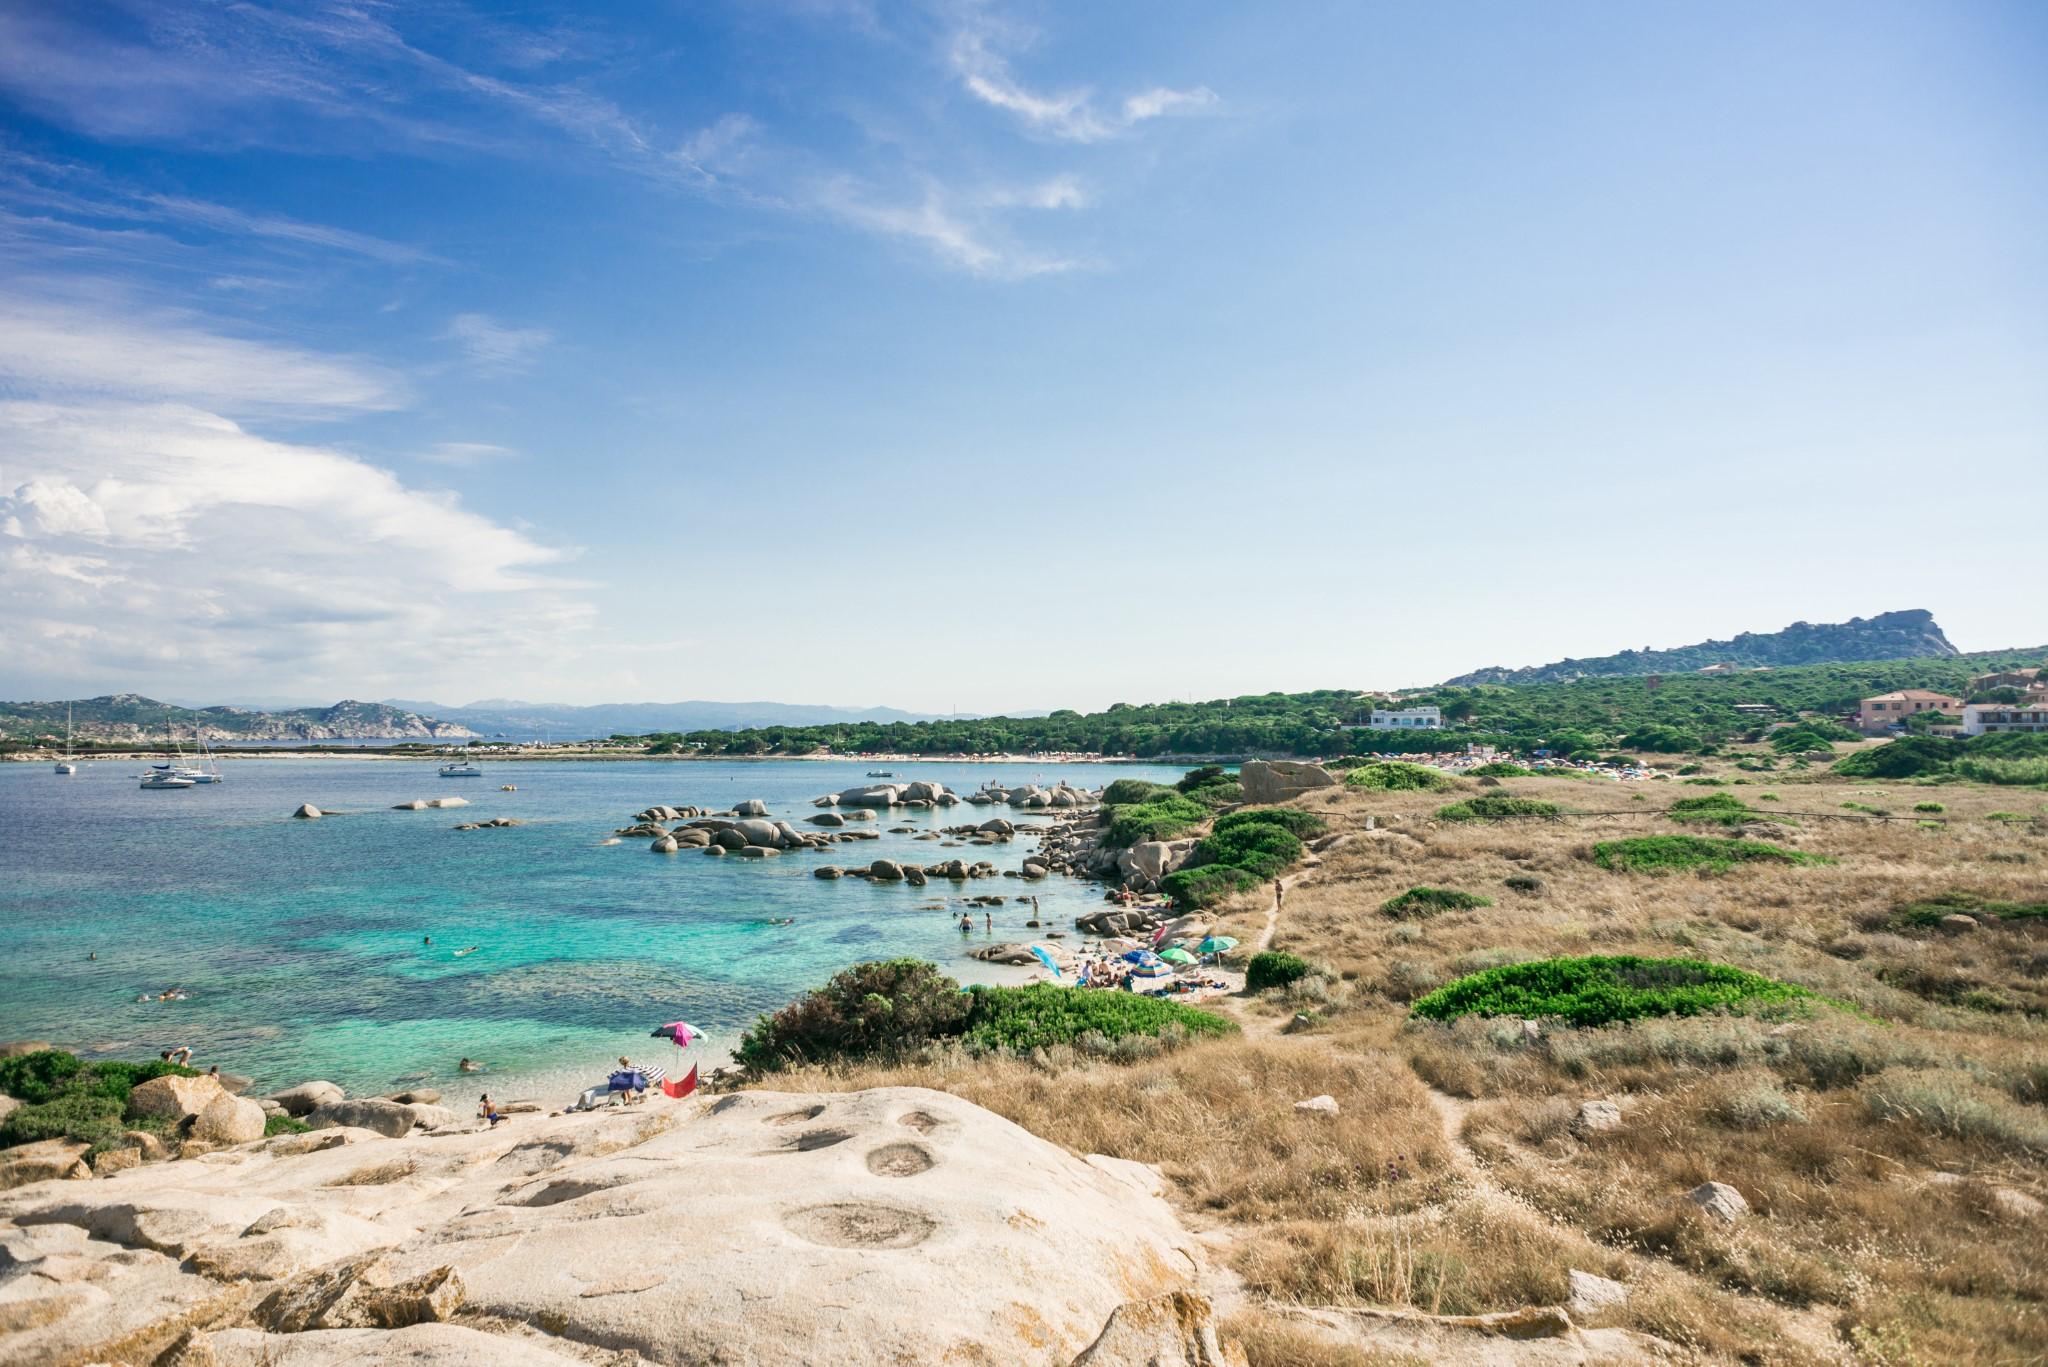 Zia Culumba Beach. Sardinia. Capo Testa. Italy. Top View to Sea.